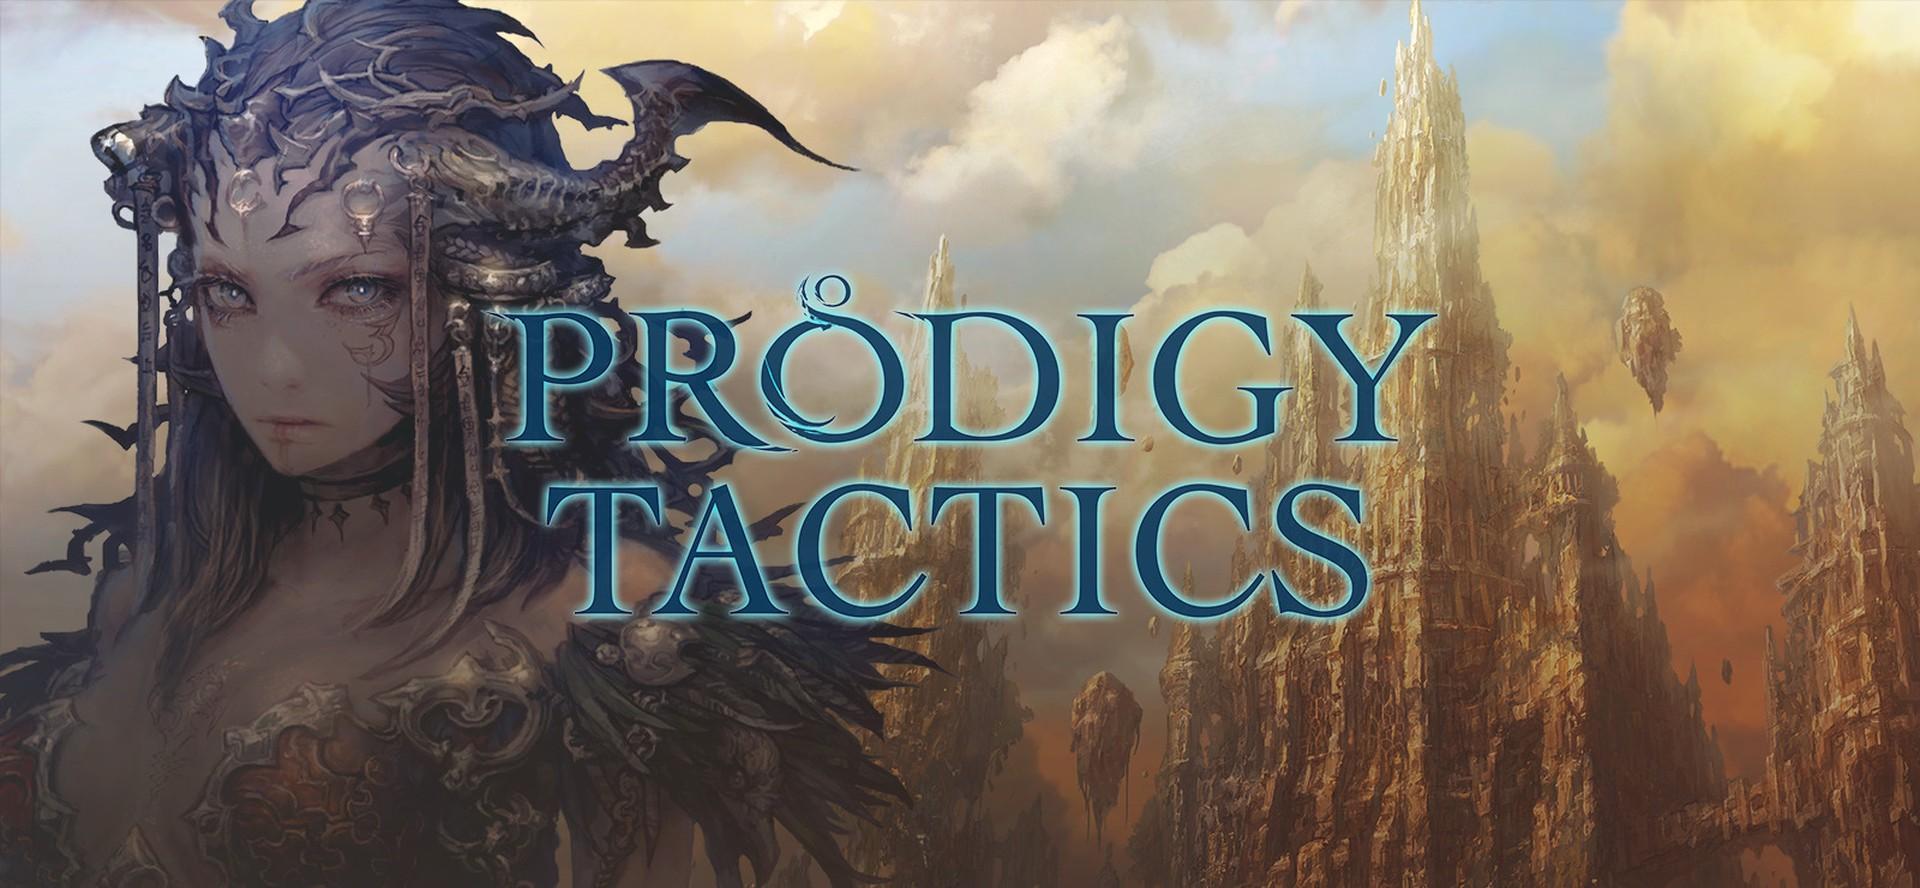 Prodigy Tactics